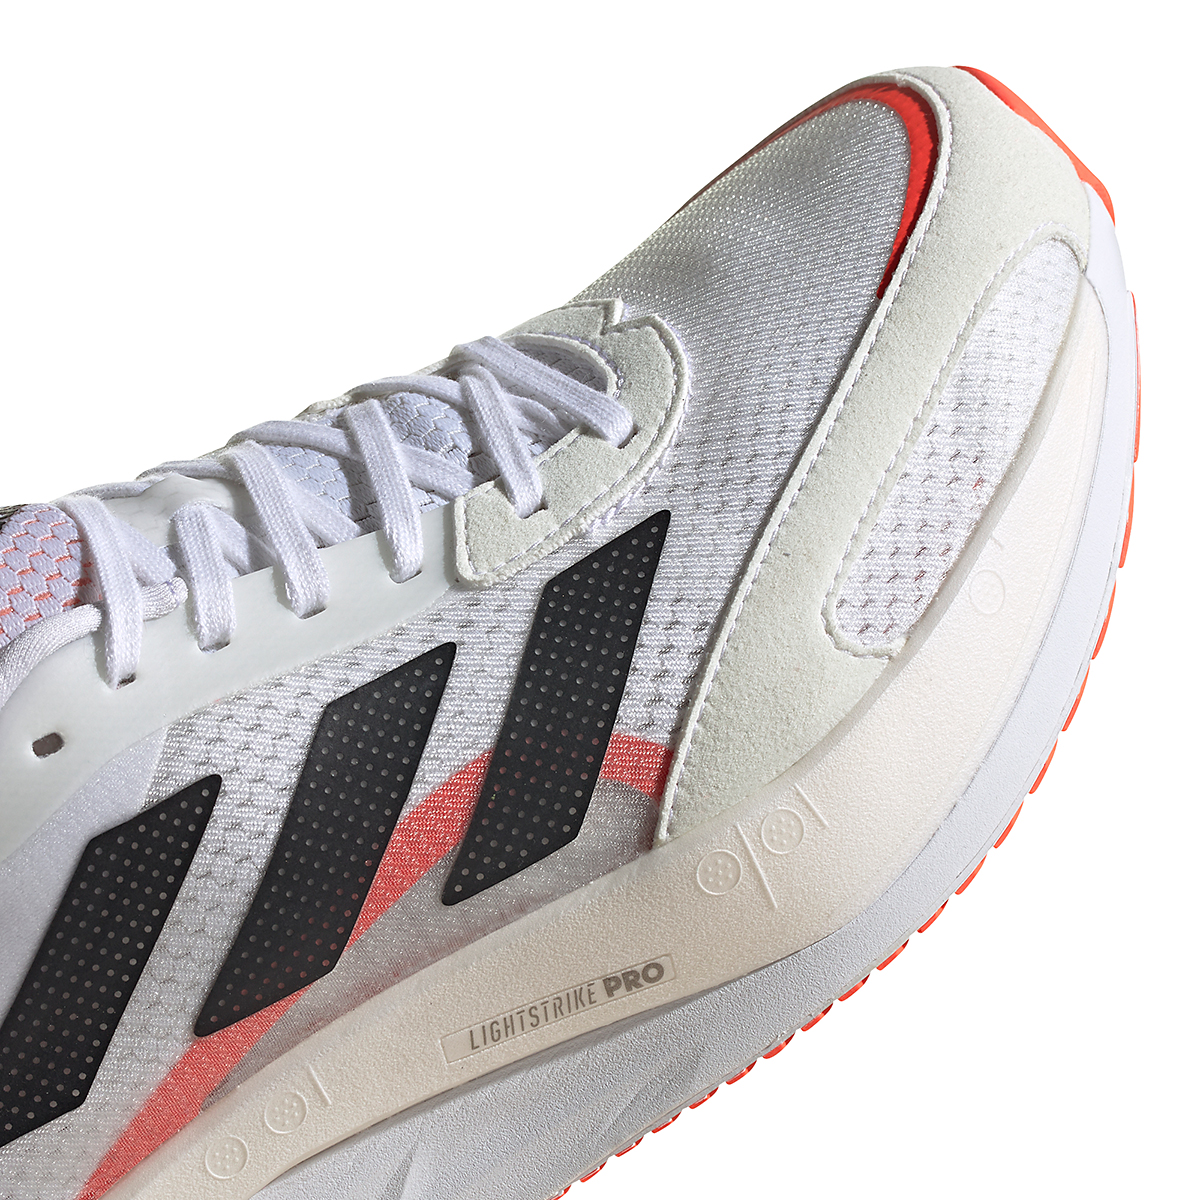 Men's Adidas Adizero Boston 10 Running Shoe - Color: Black/White/Solar Red - Size: 7 - Width: Regular, Black/White/Solar Red, large, image 5